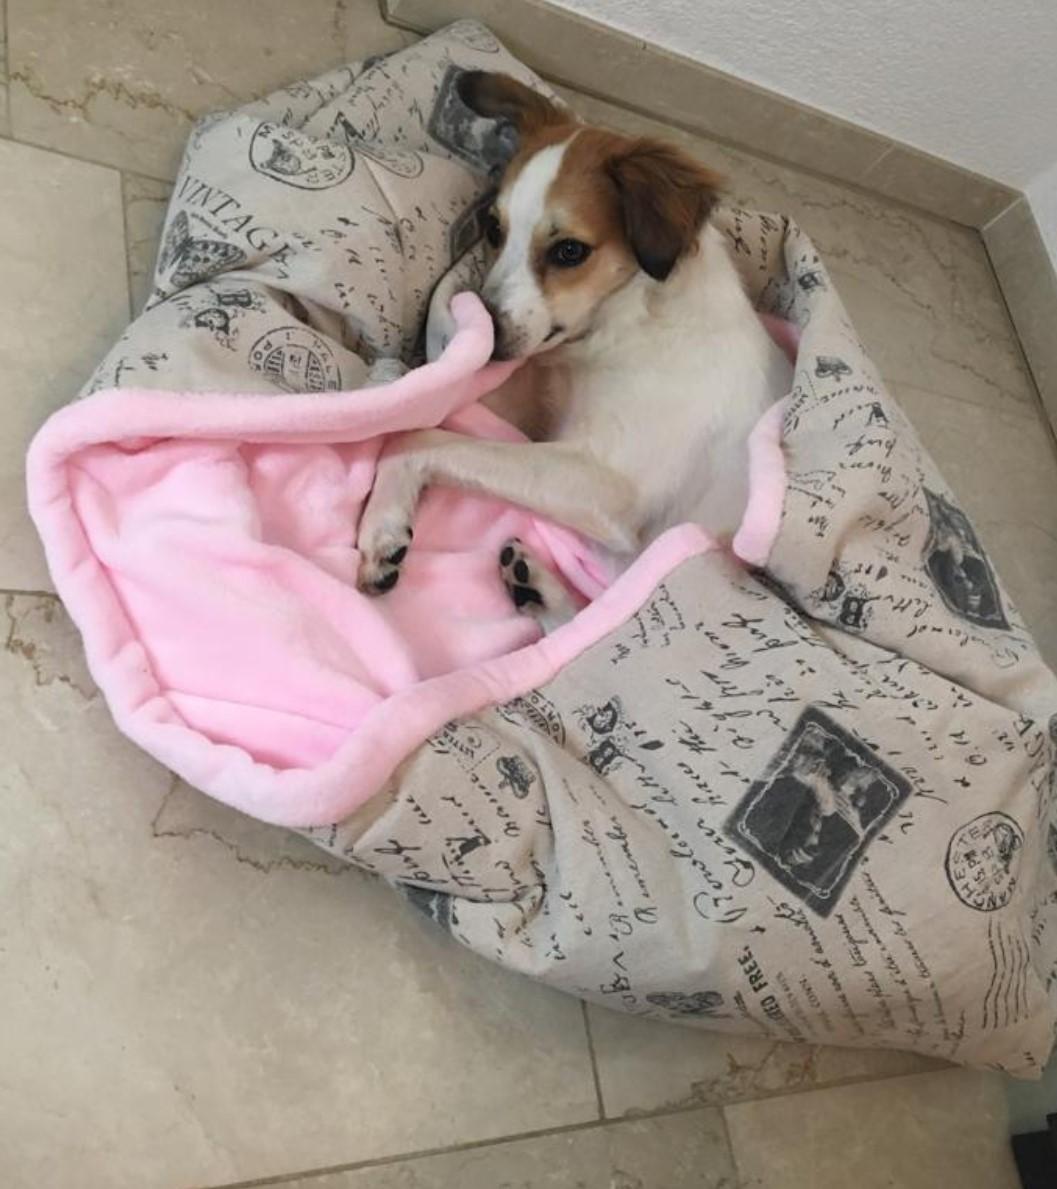 swiss hundeleinen- Hundeschlafsack, Hundedecke, Hundekissen, Schlafplatz,Wendeschlafsack,